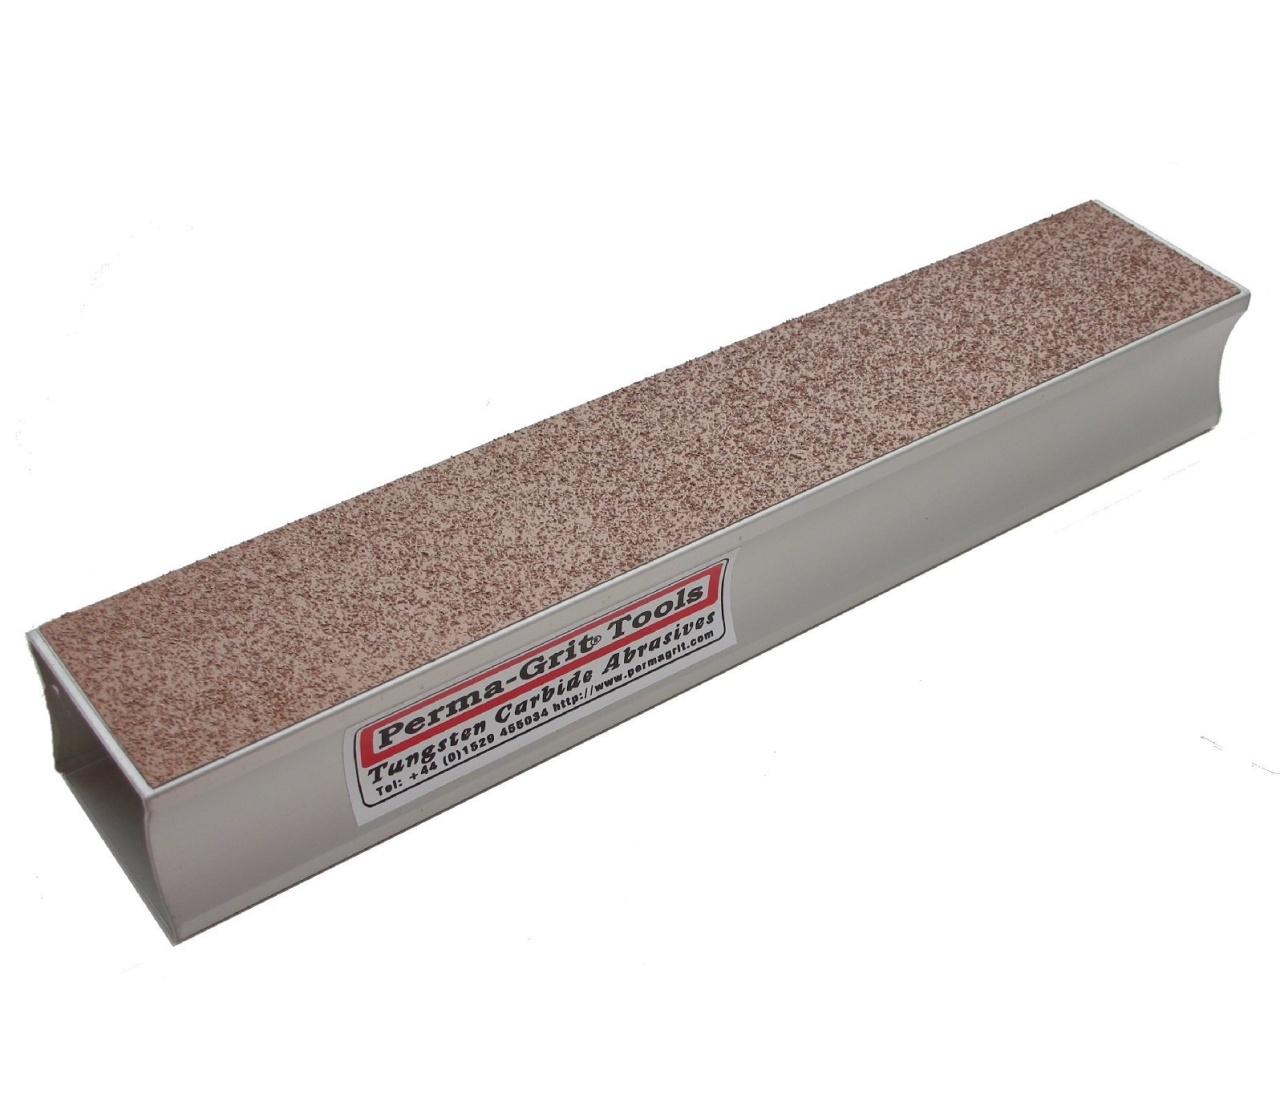 Perma-Grit Sanding Block 280x51 mm